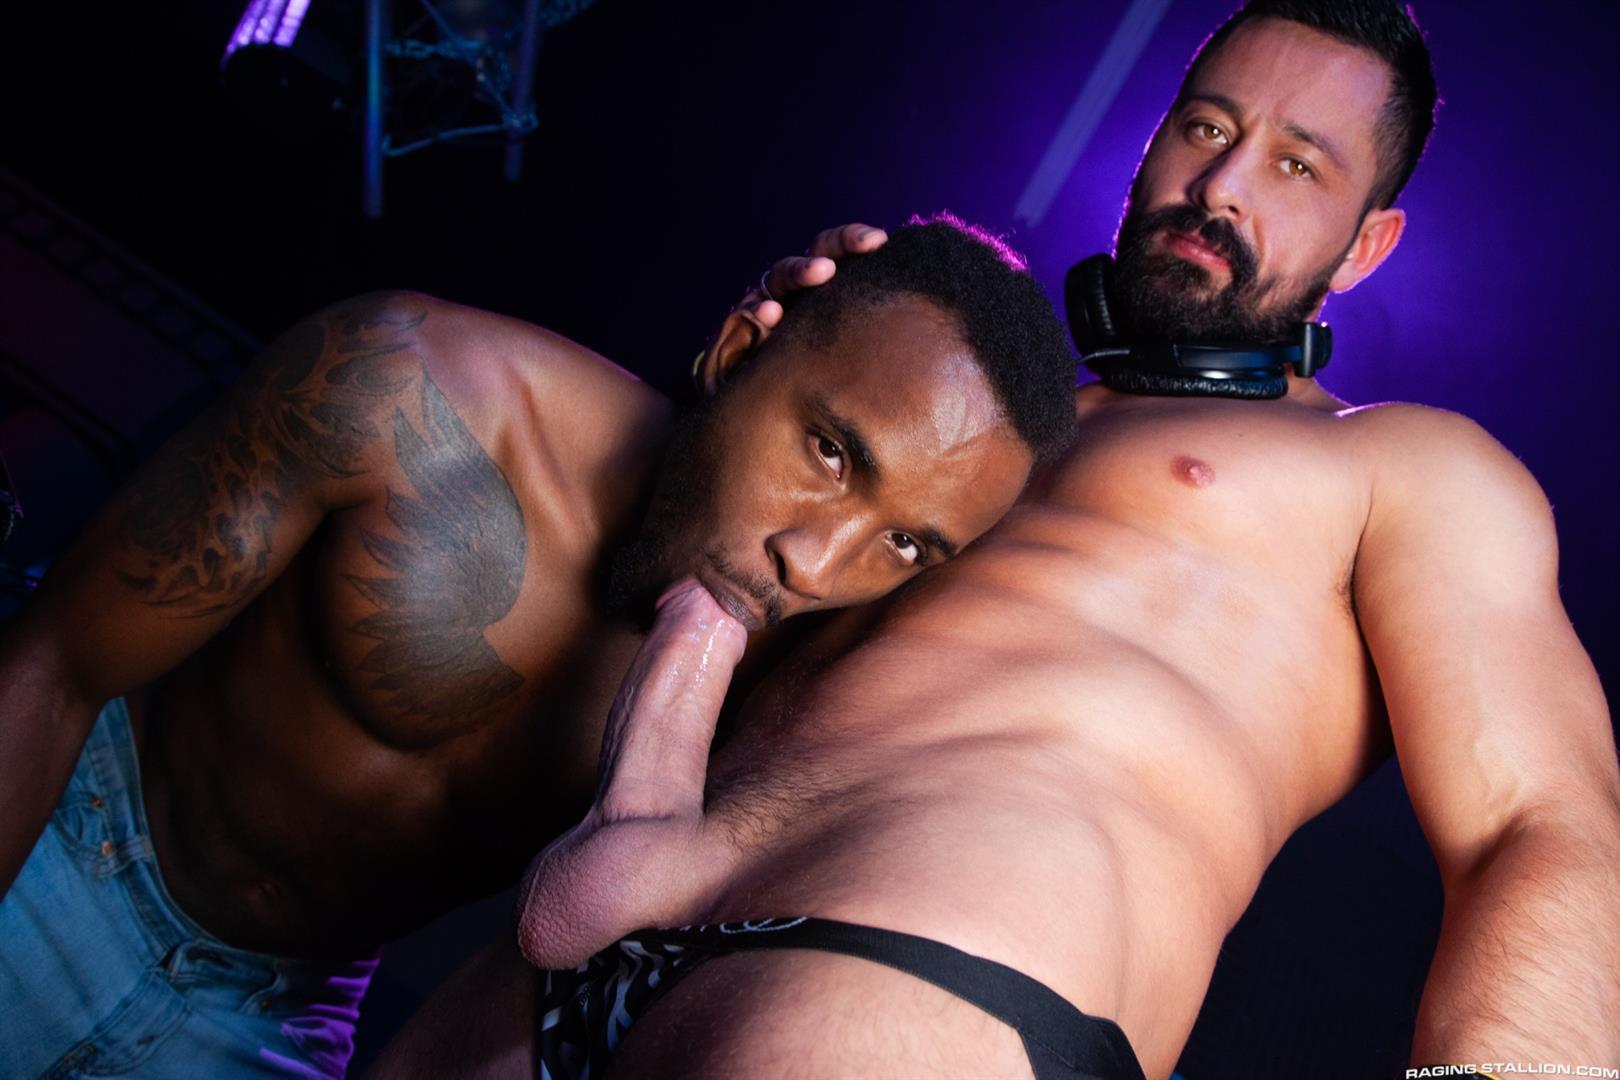 Raging-Stallion-Pheonix-Fellington-and-Cristian-Sam-Big-Black-Cocksucking-Video-10 Getting My Big Black Cock Sucked In The DJ Booth